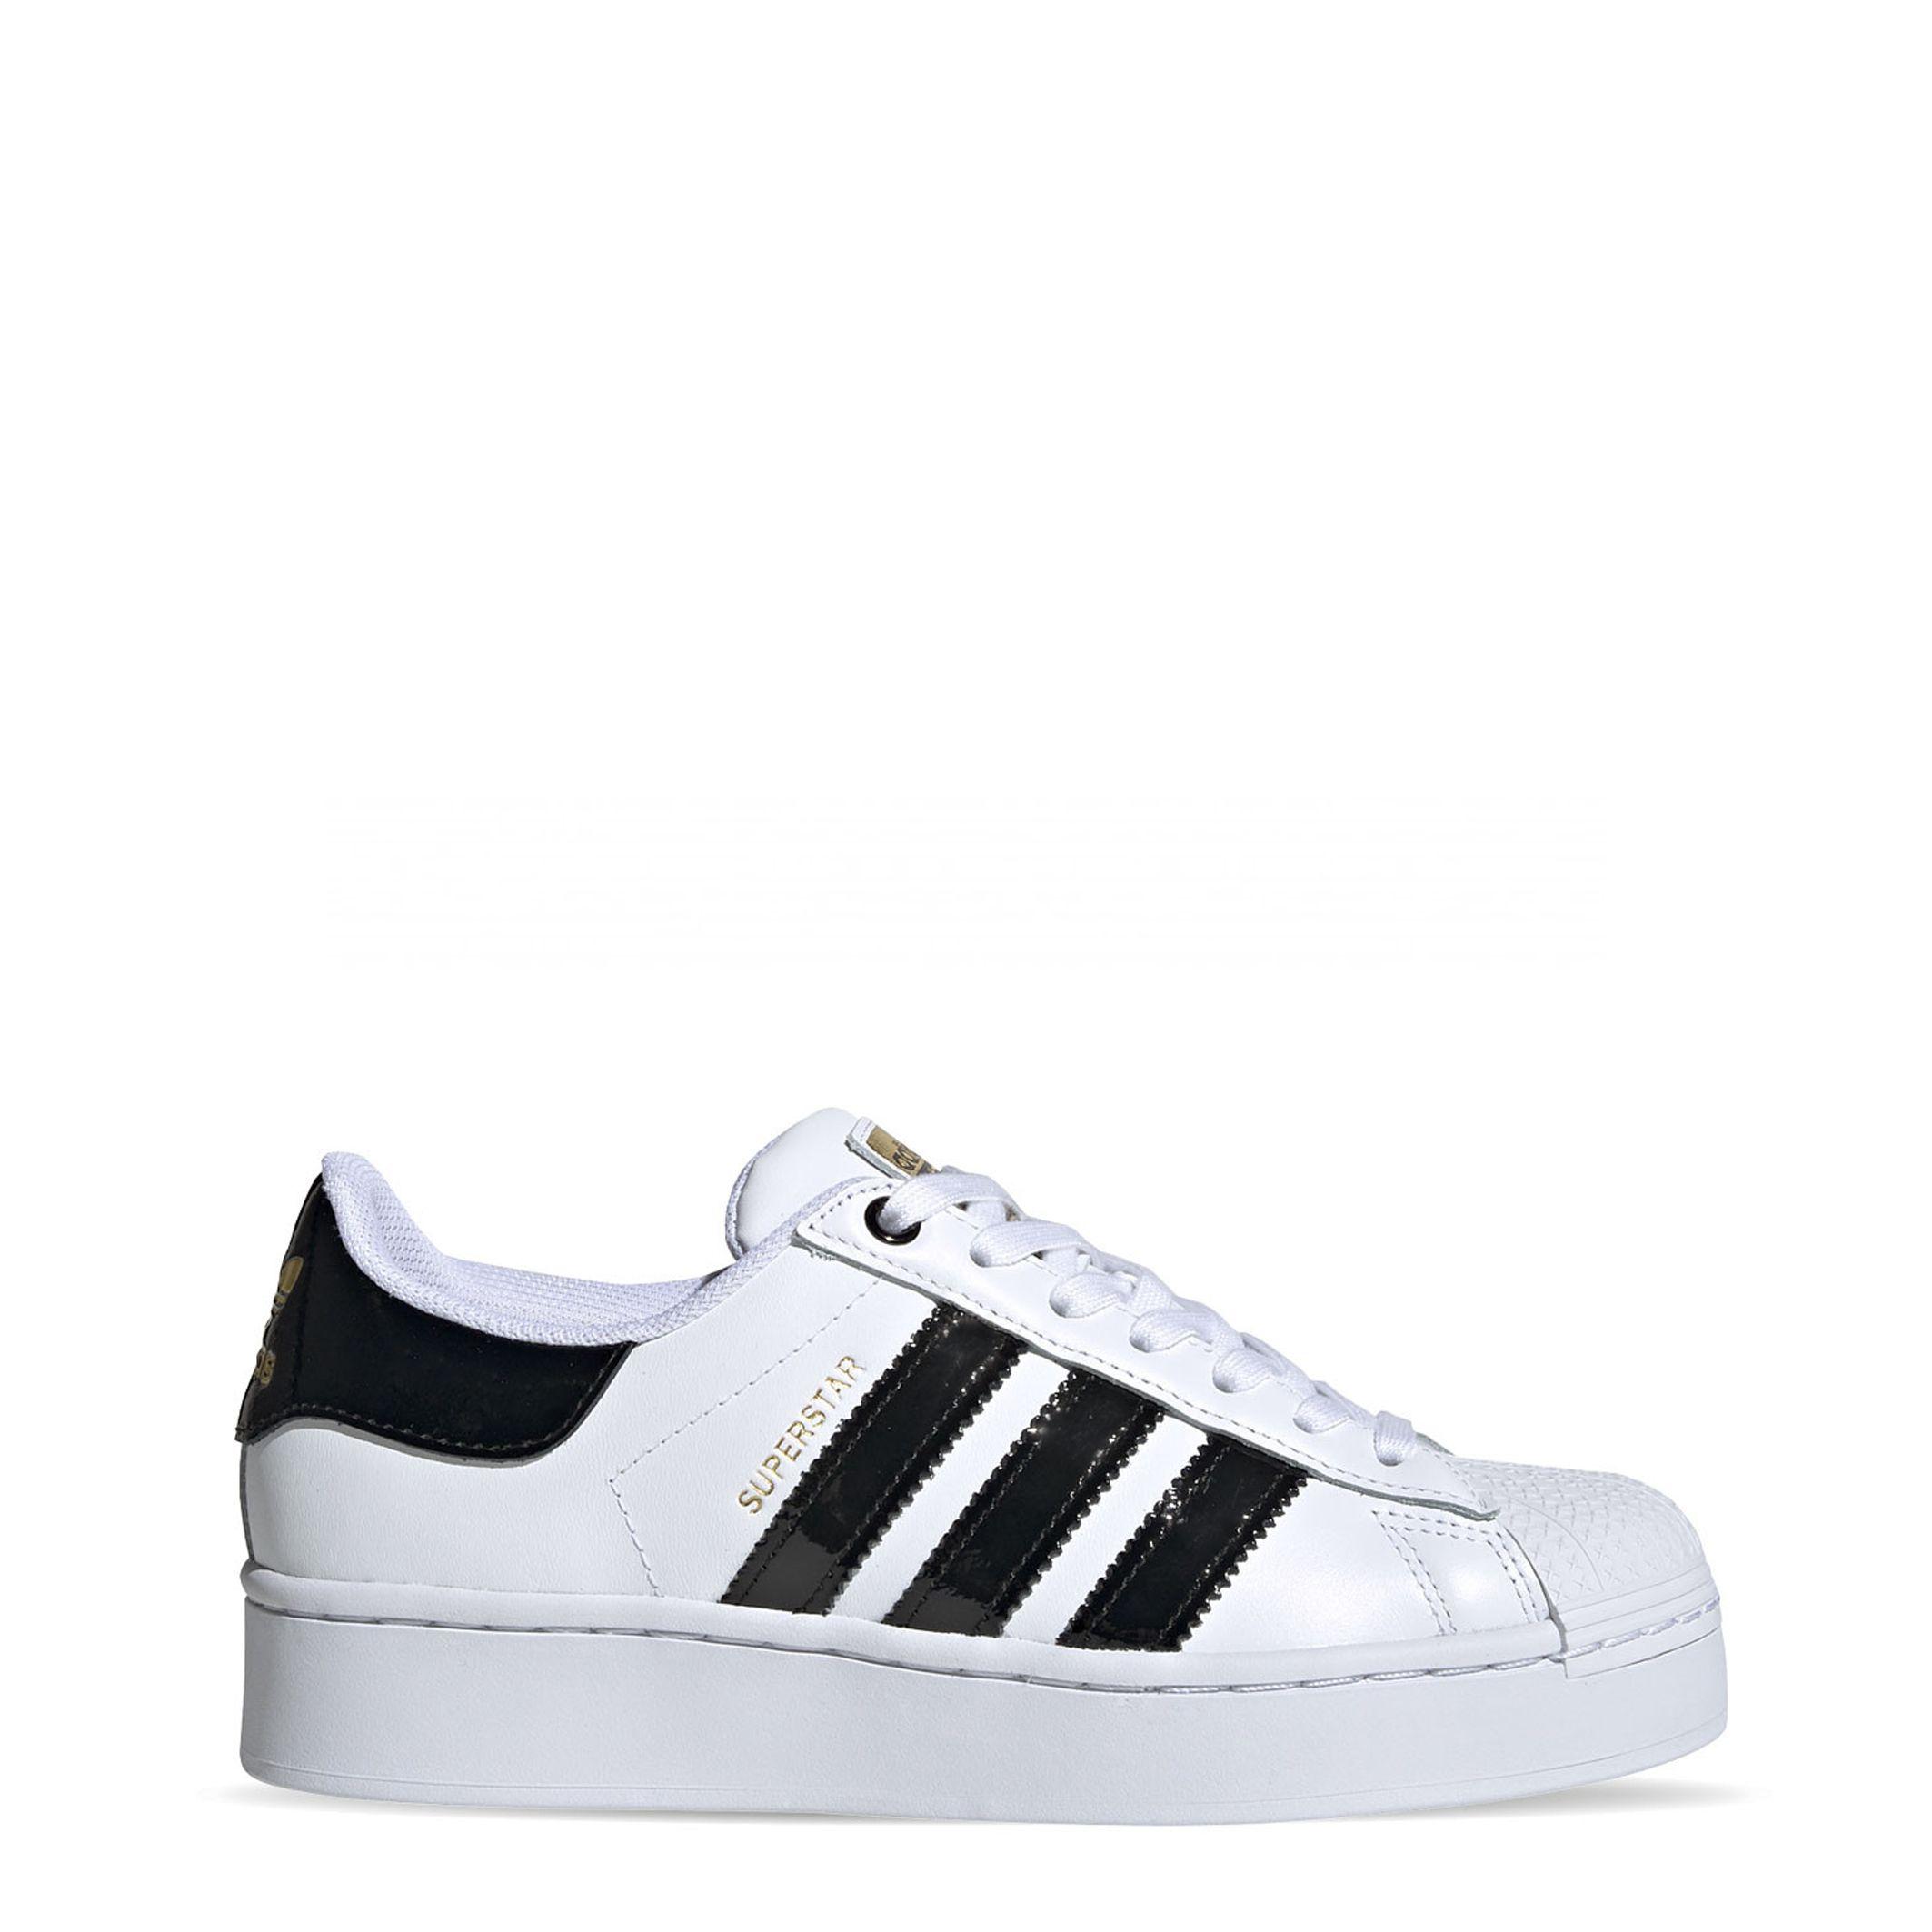 Adidas – SuperstarBold-W – Blanco